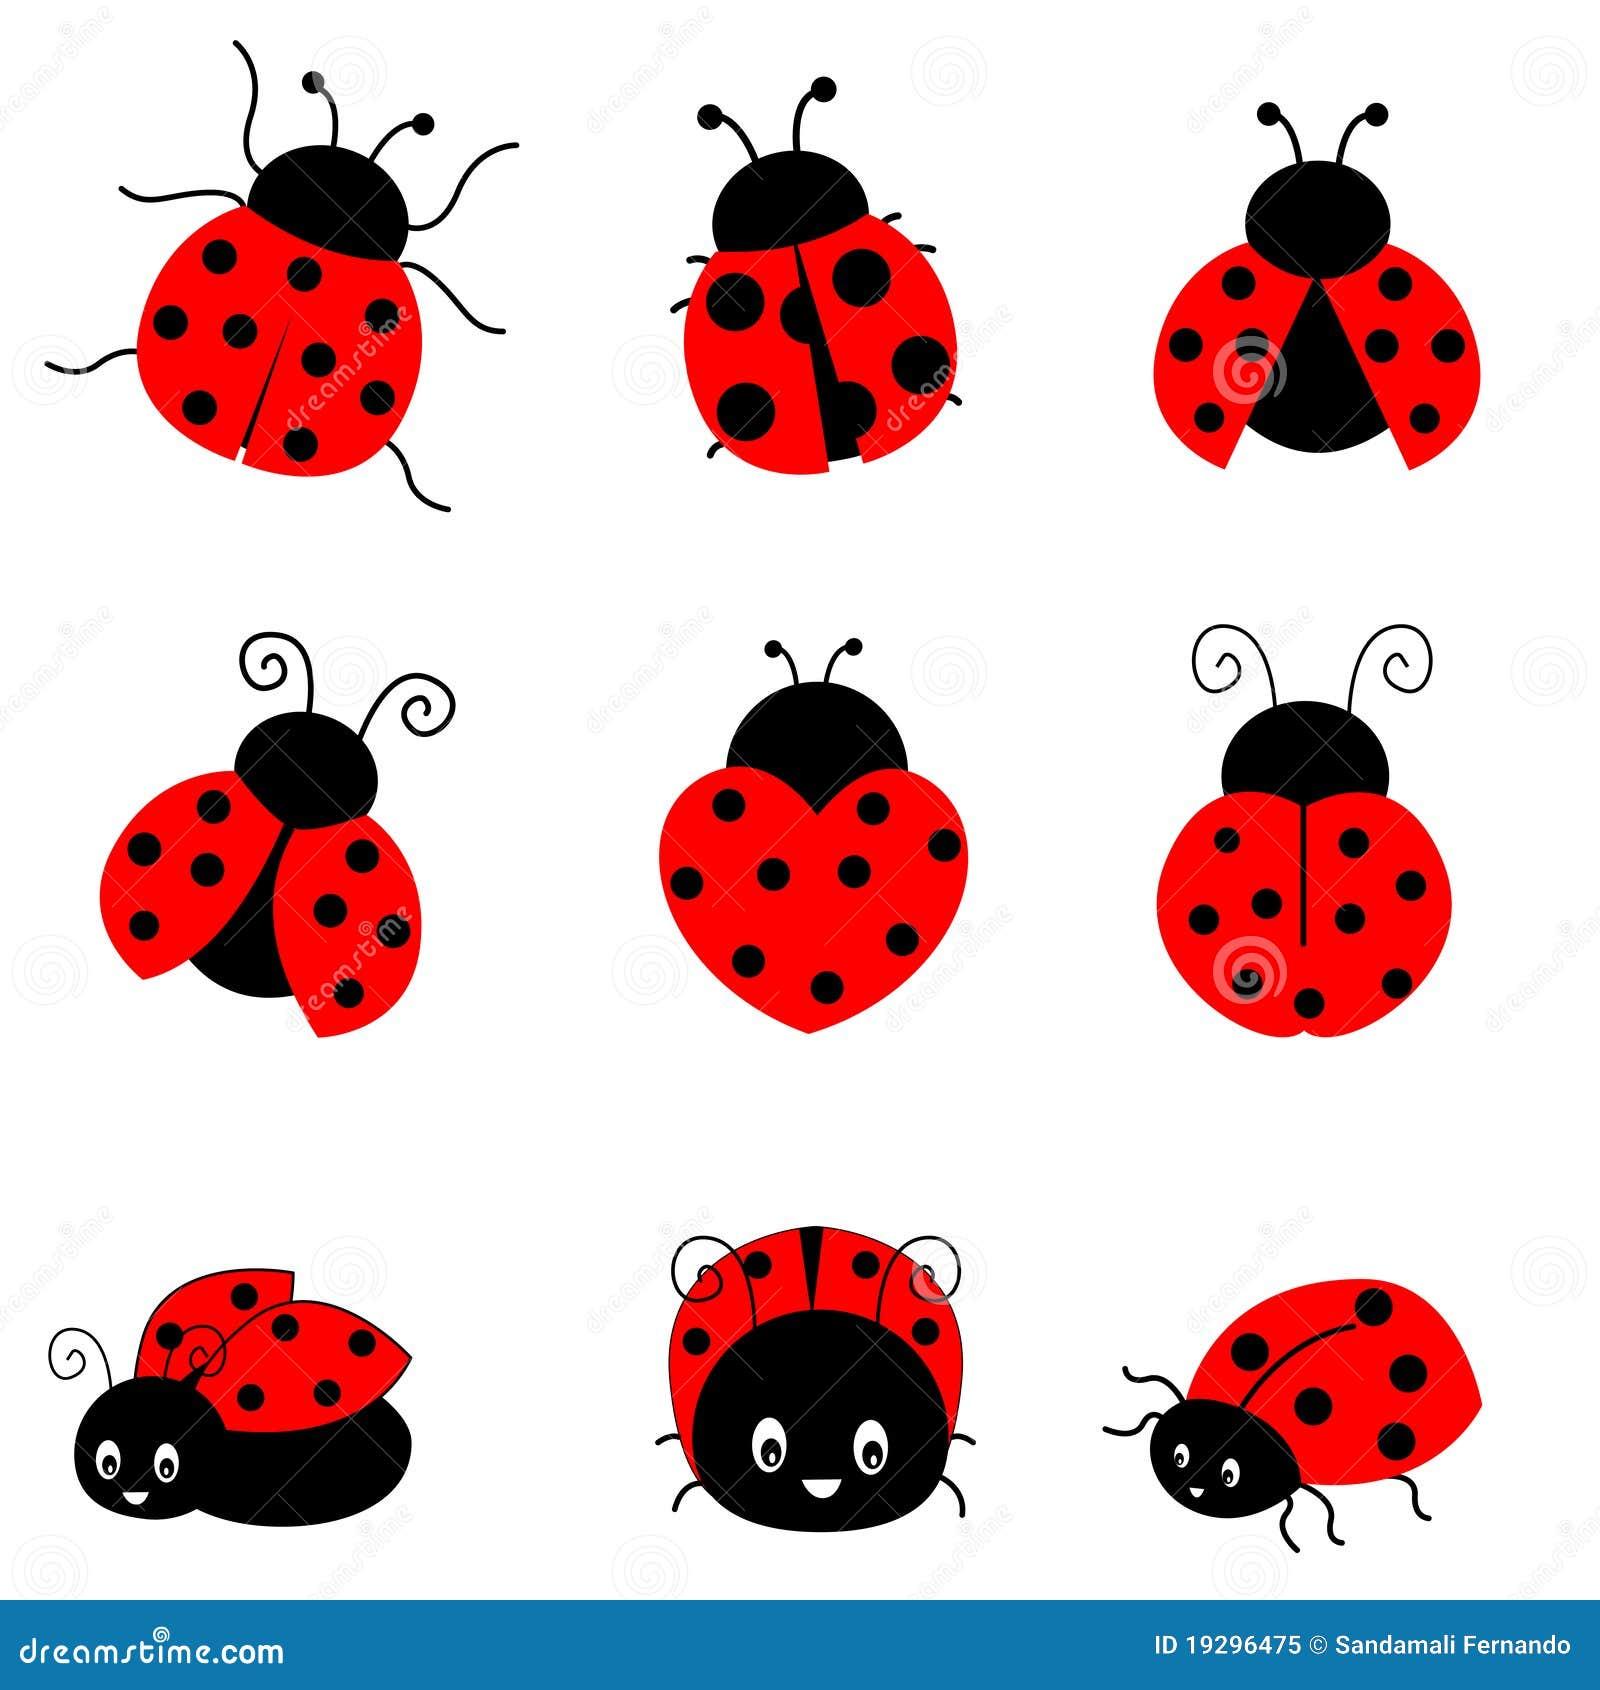 lieveheersbeestje royalty vrije stock foto afbeelding ladybug clip art free ladybug clip art free black and white